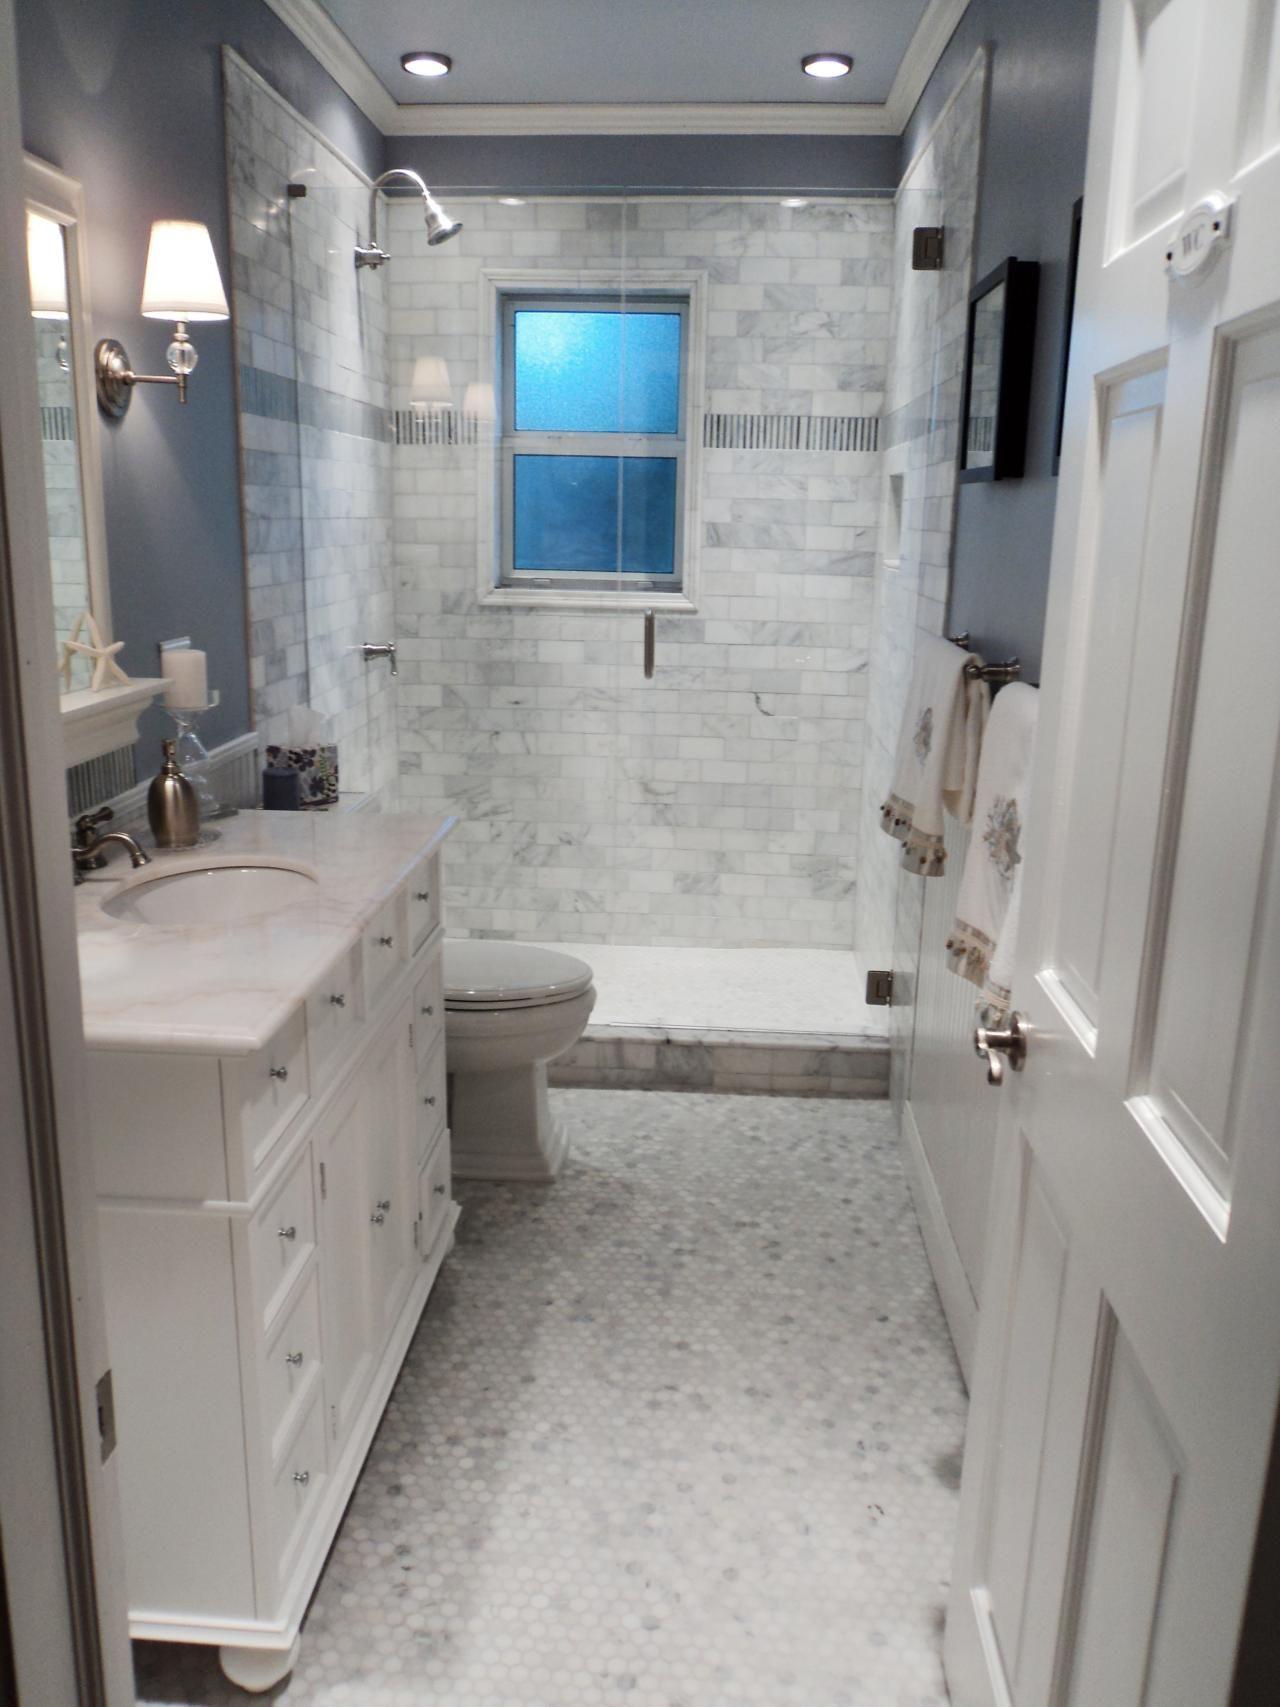 Photo Page Photo Library Hgtv Bathroom Layout Stylish Bathroom Small Master Bathroom